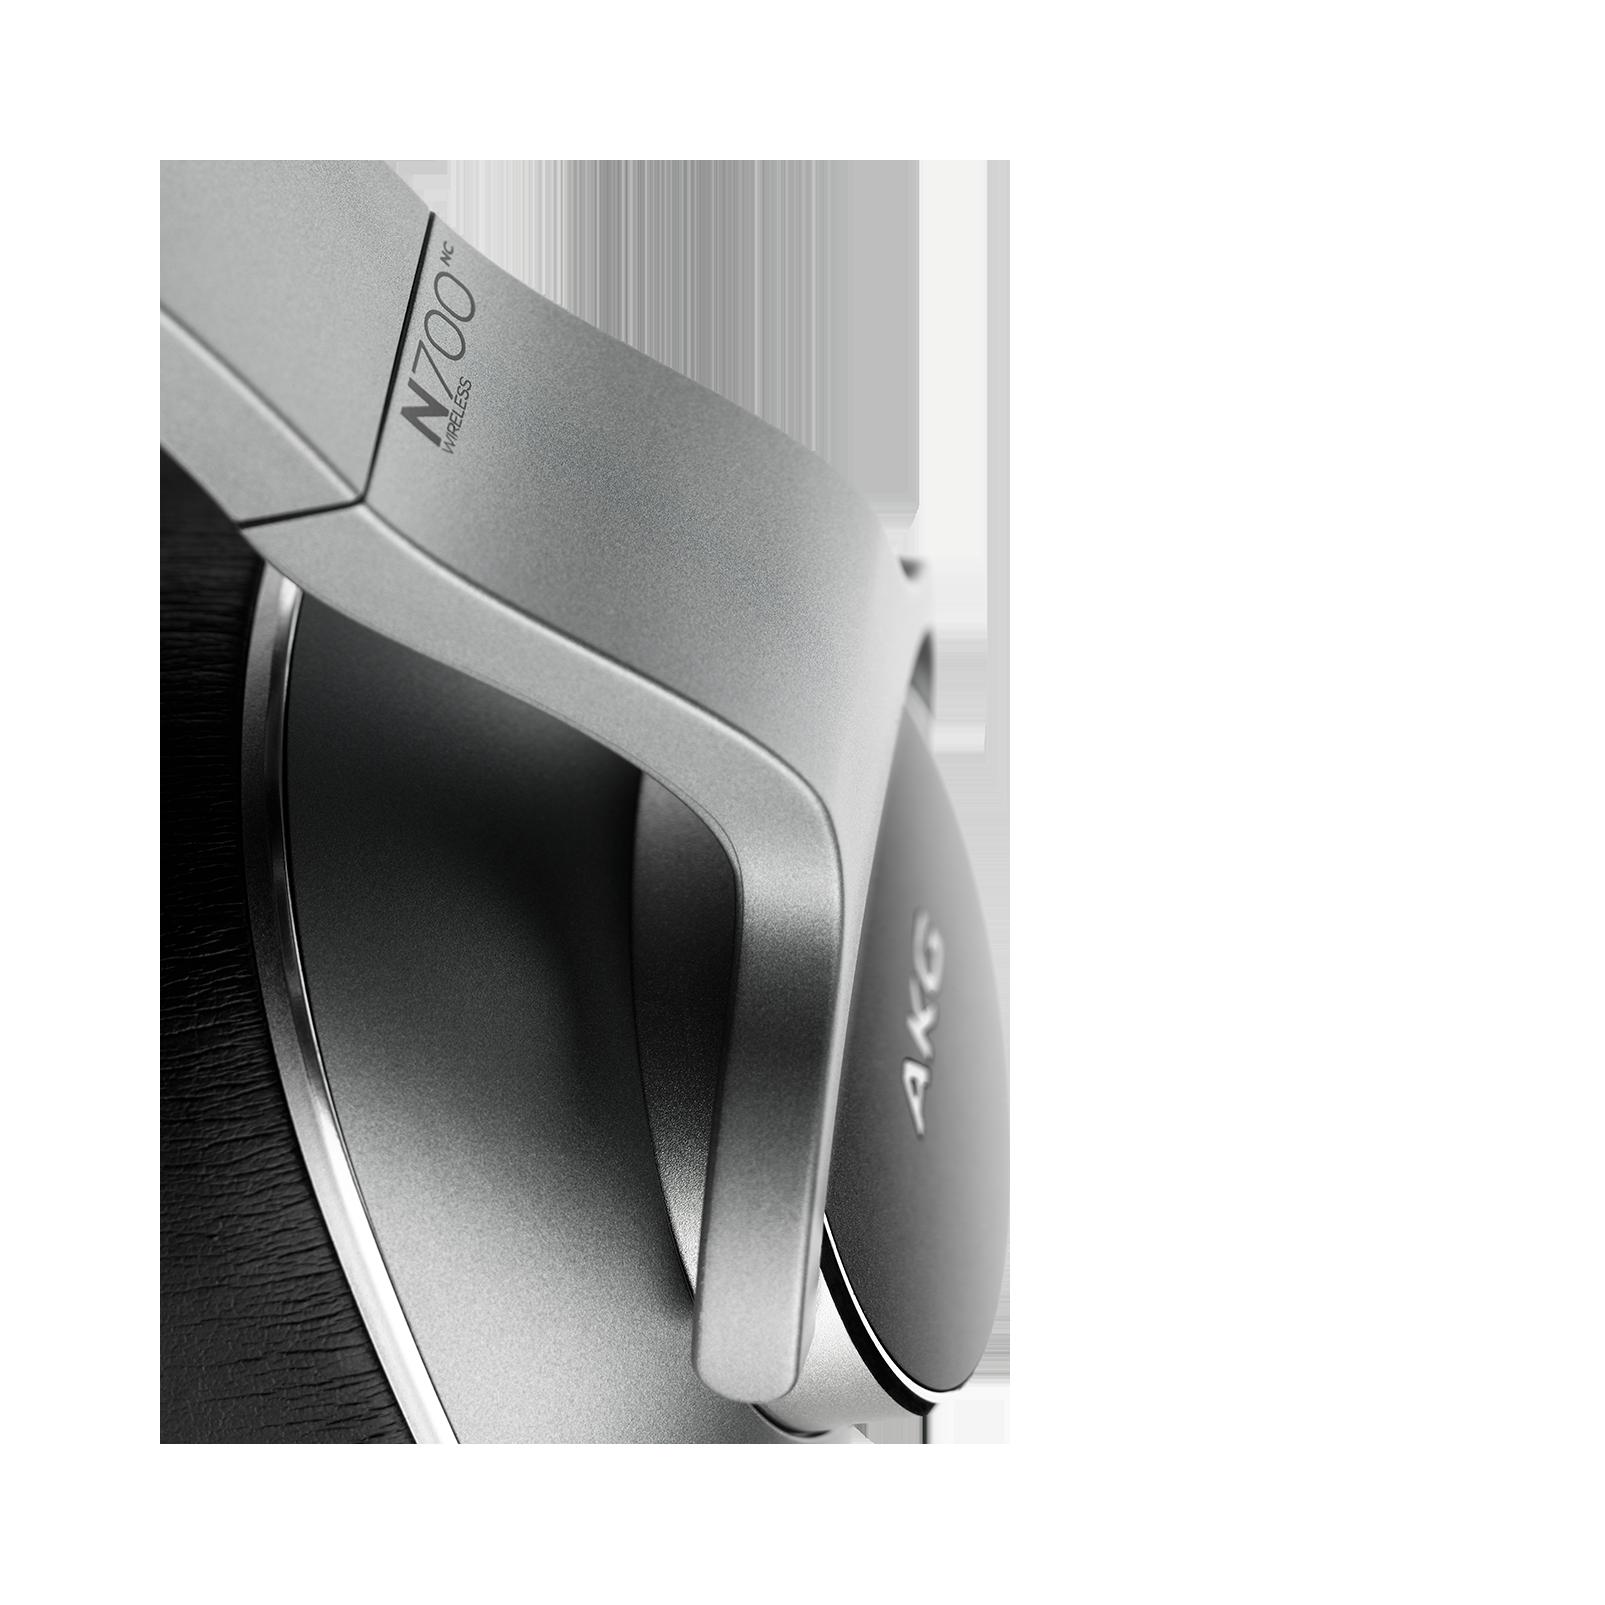 AKG N700NC Wireless - Silver - Wireless, Adaptive Noise Cancelling Headphones - Detailshot 1